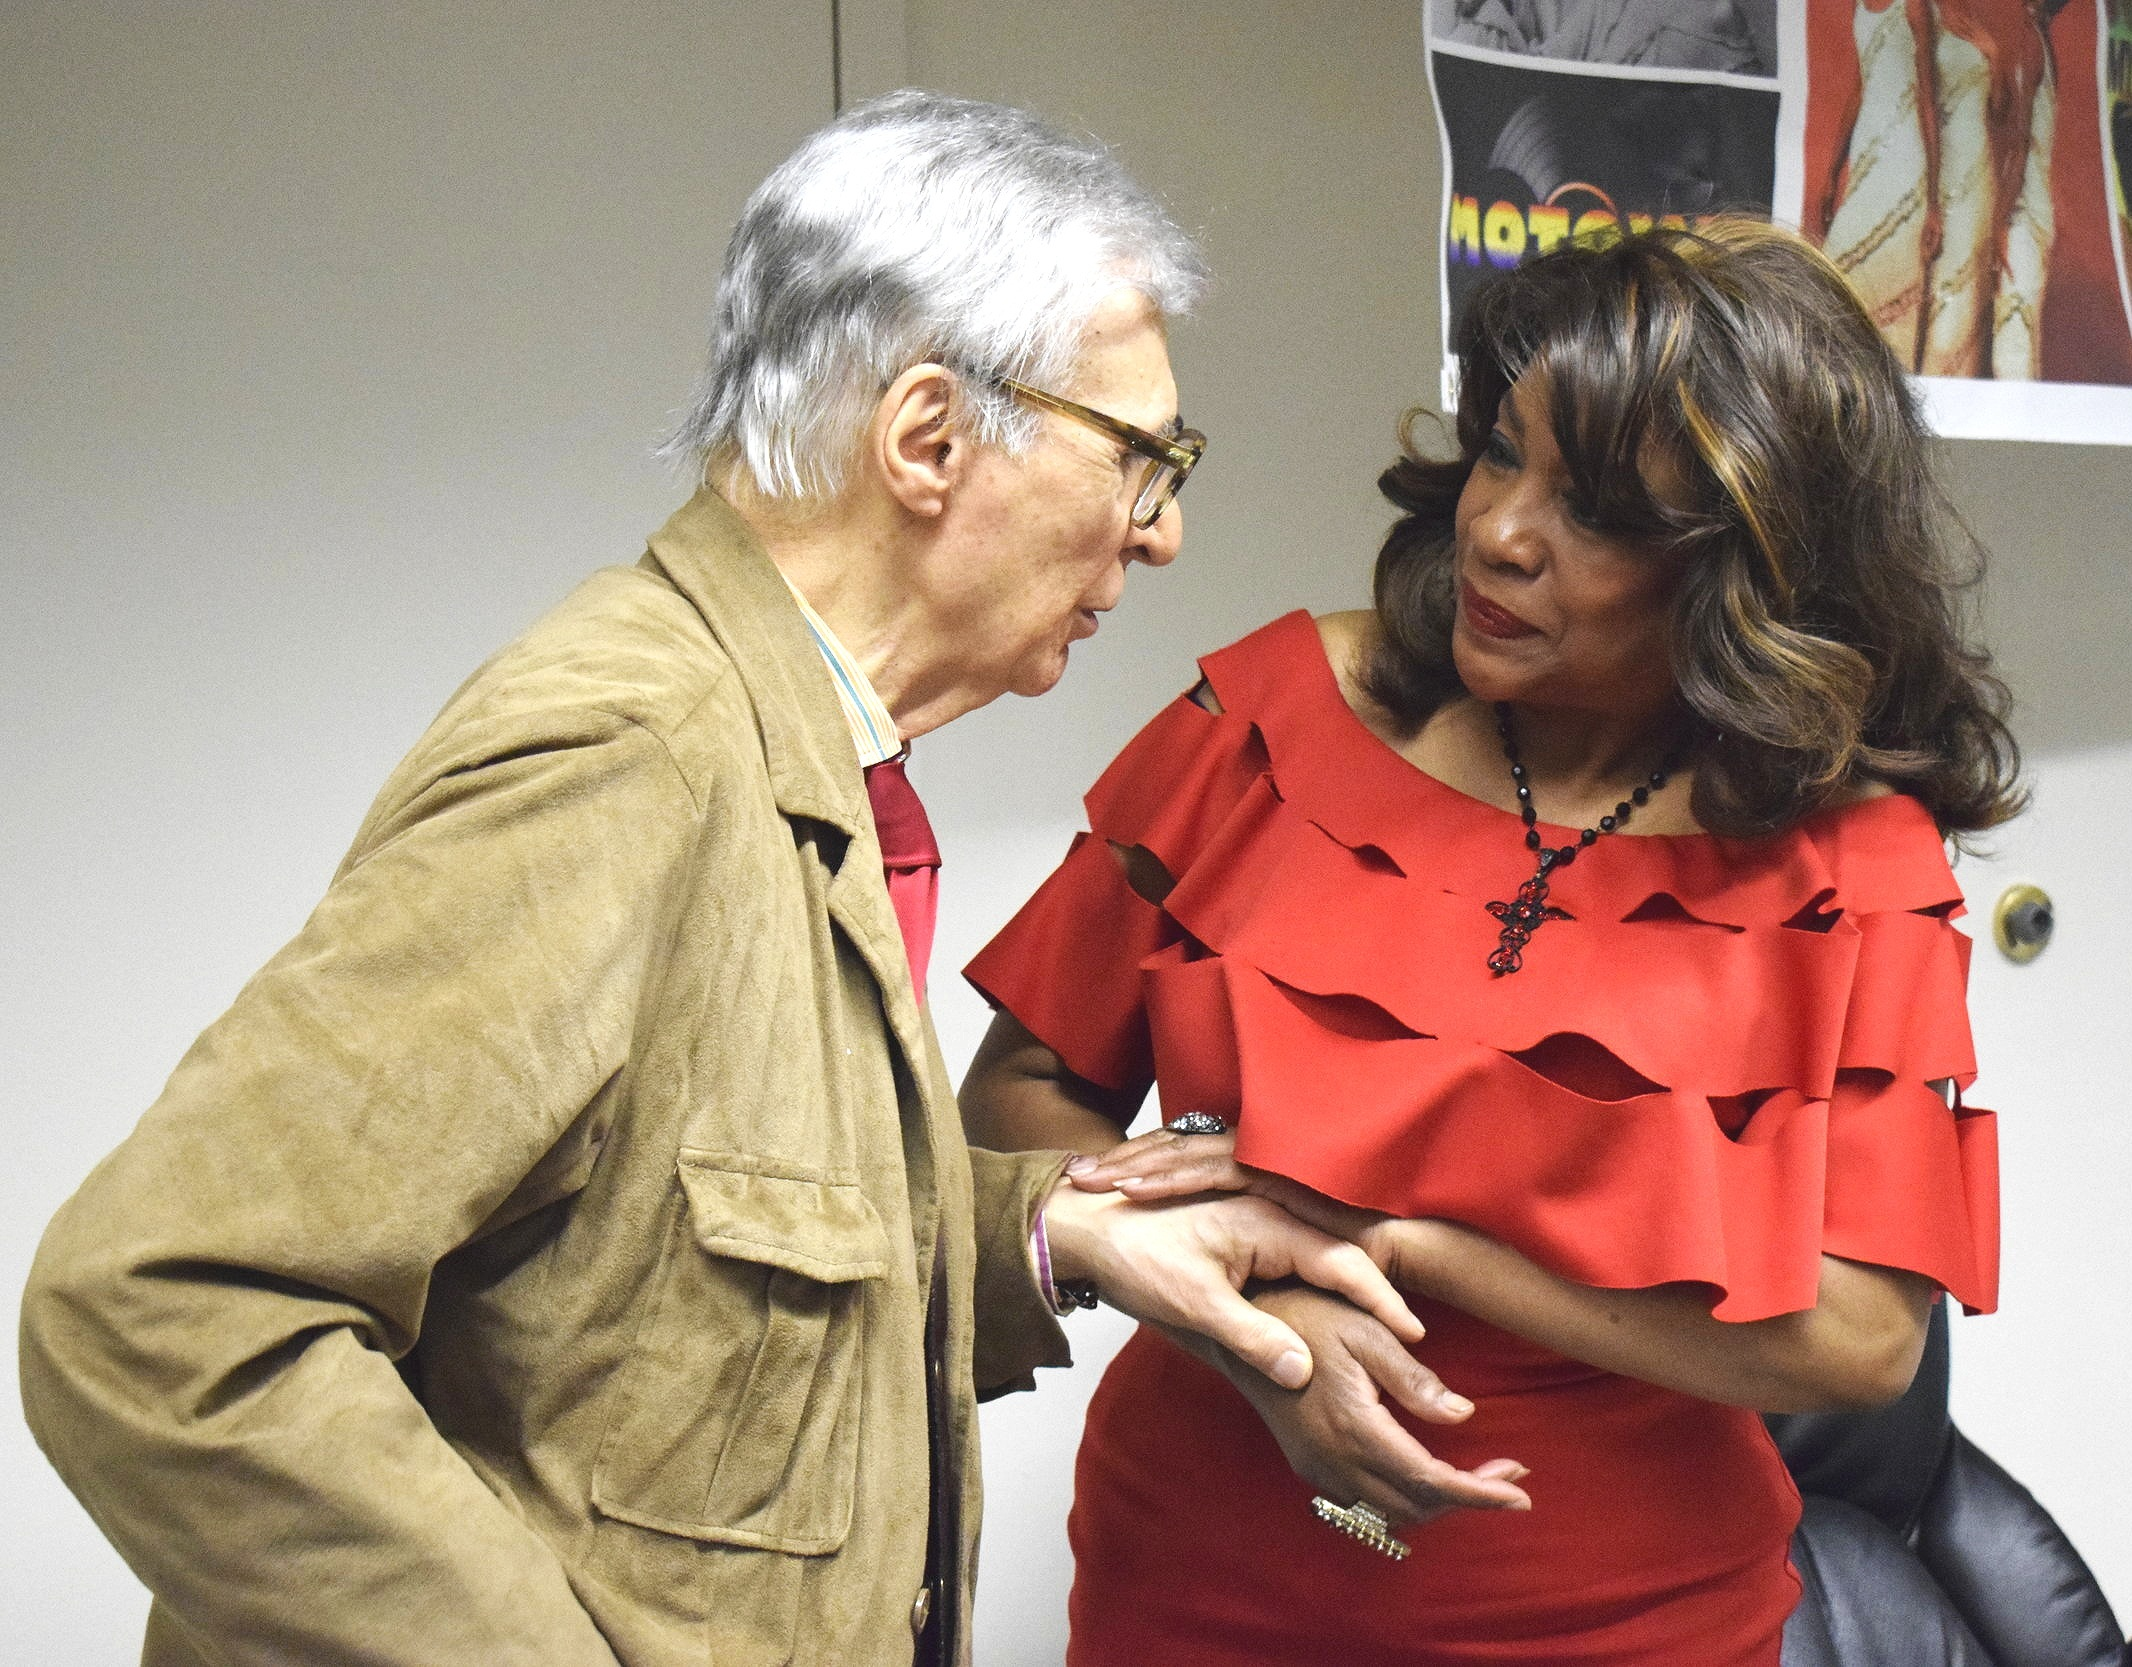 Mary Wilson and The Amazing Kreskin speak at Big Apple Comic Con | Photo Credit:  Lauren Johnson